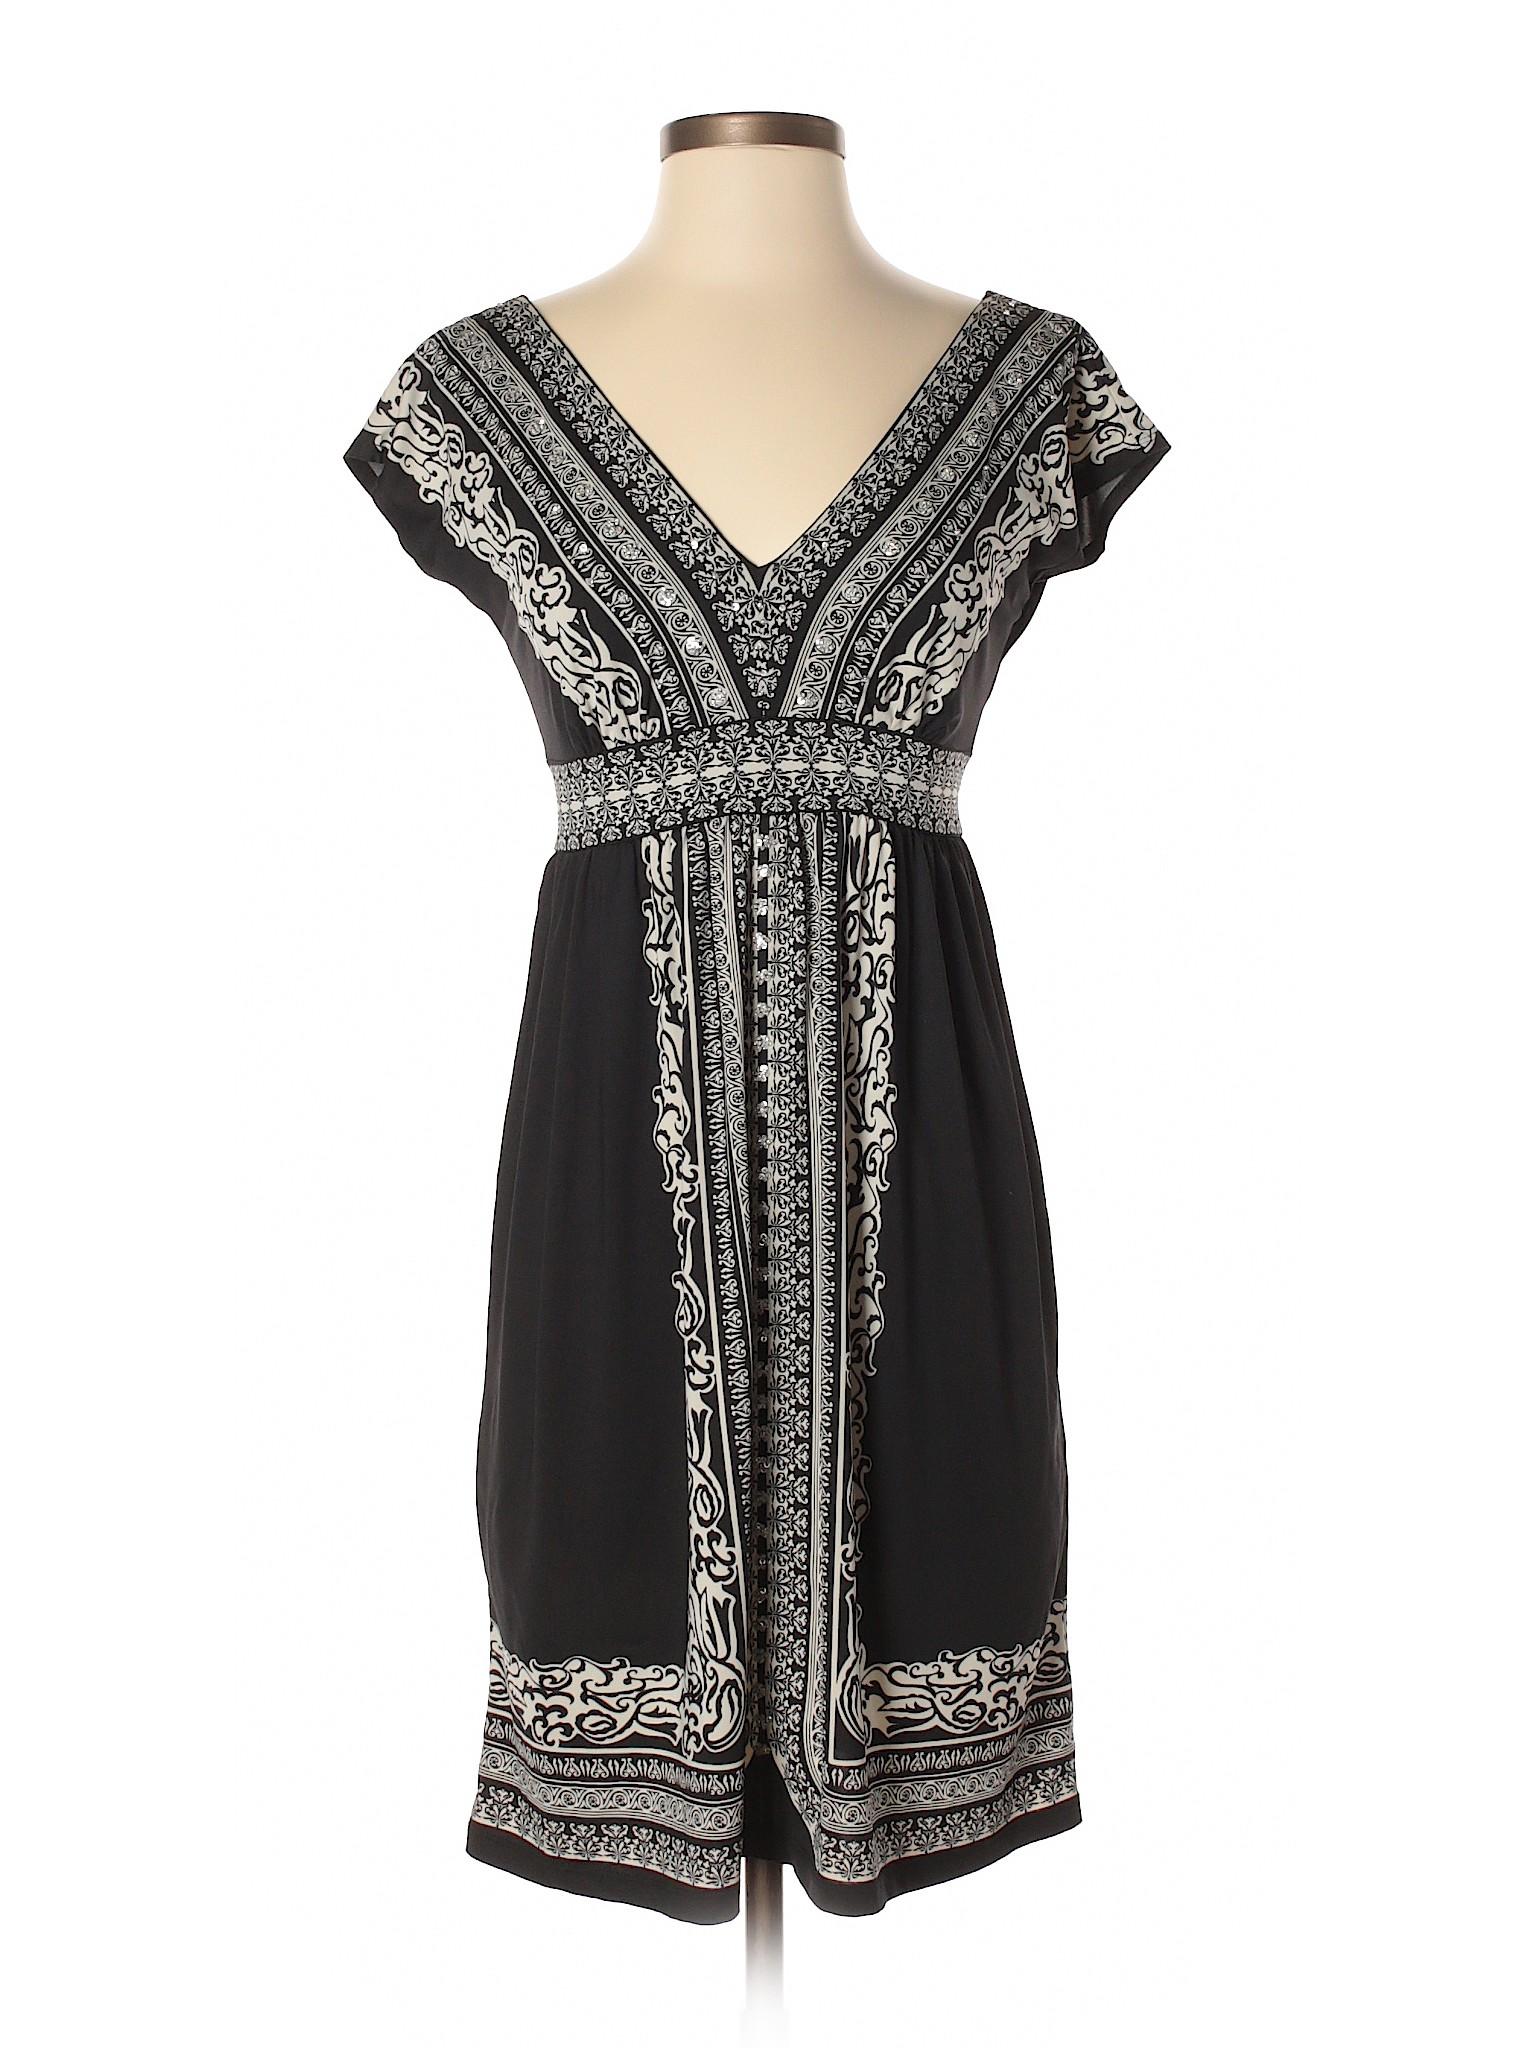 Casual Boutique International winter Concepts Dress INC nFg7COgqx4